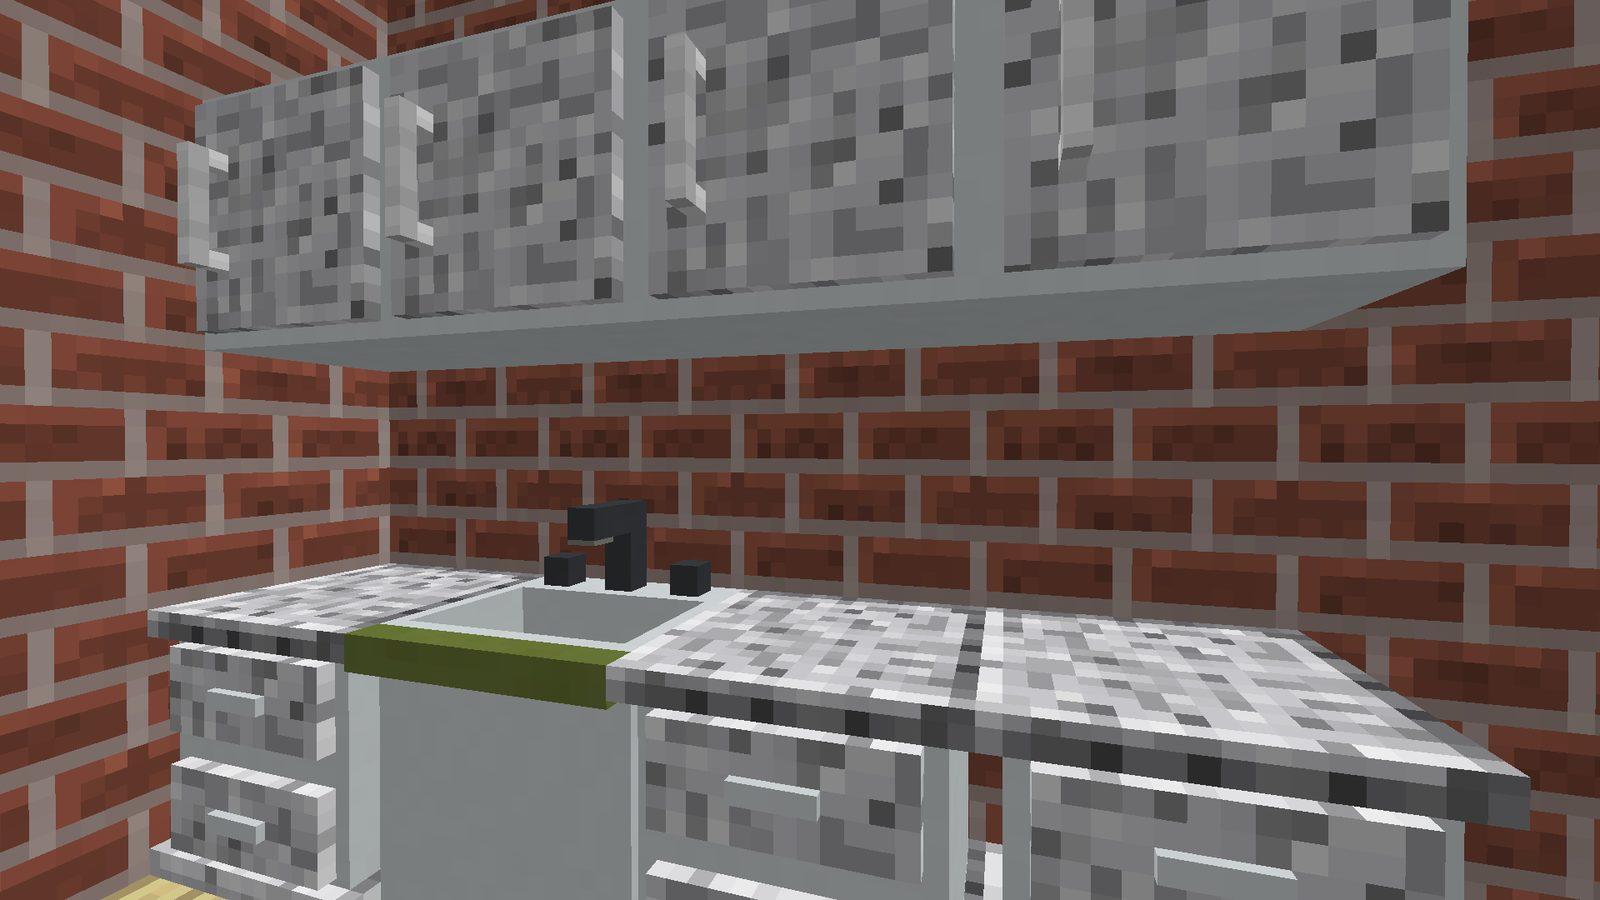 Mrcrayfish S Furniture Mod For Minecraft 1 12 2